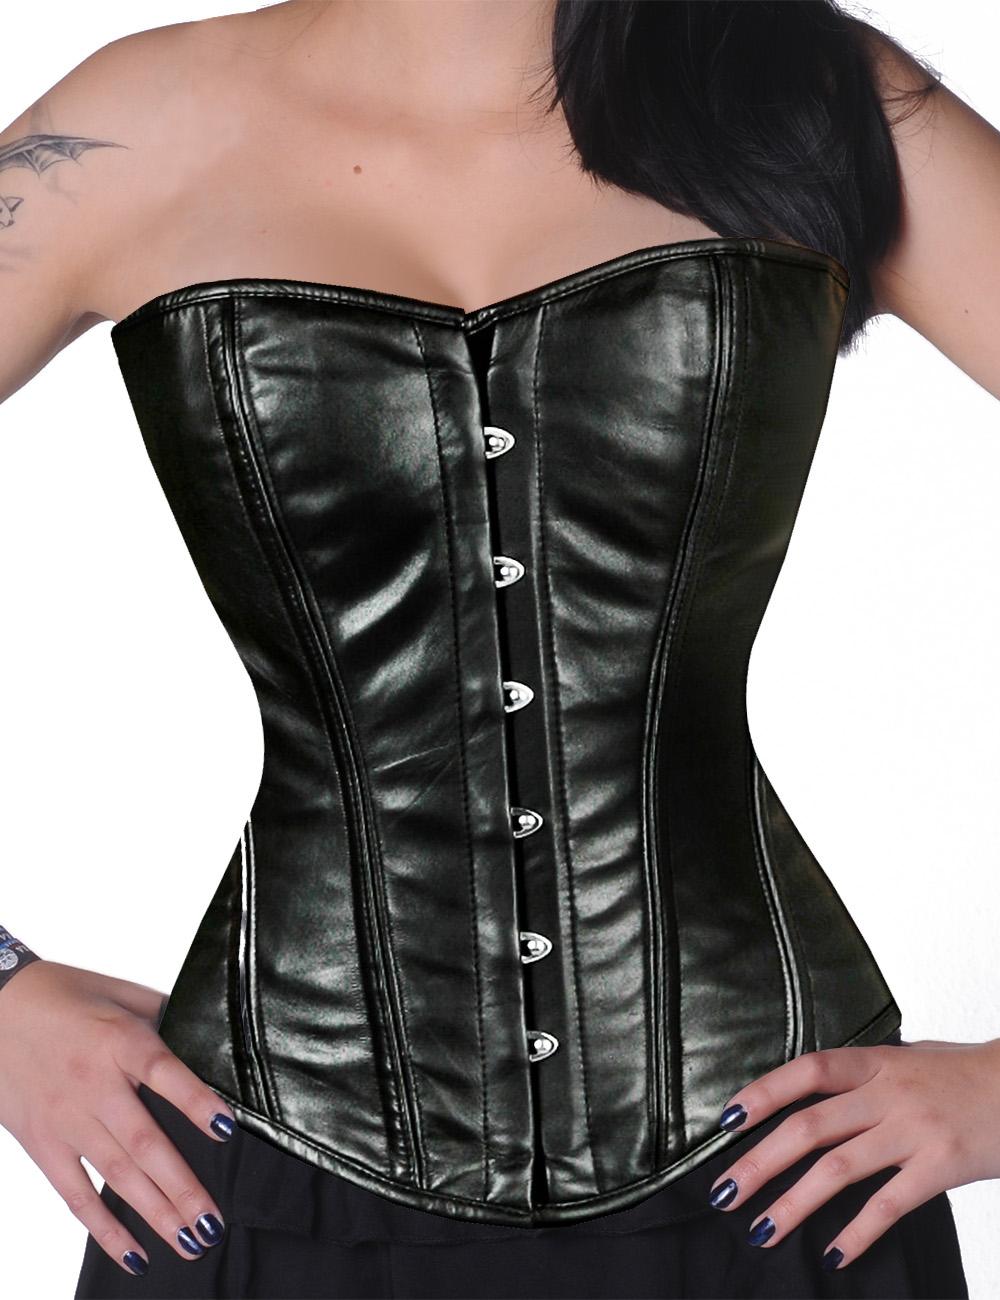 leder vollbrustkorsett schn r korsett schwarz corsage bodyshaper gothic xs 8 xxl ebay. Black Bedroom Furniture Sets. Home Design Ideas